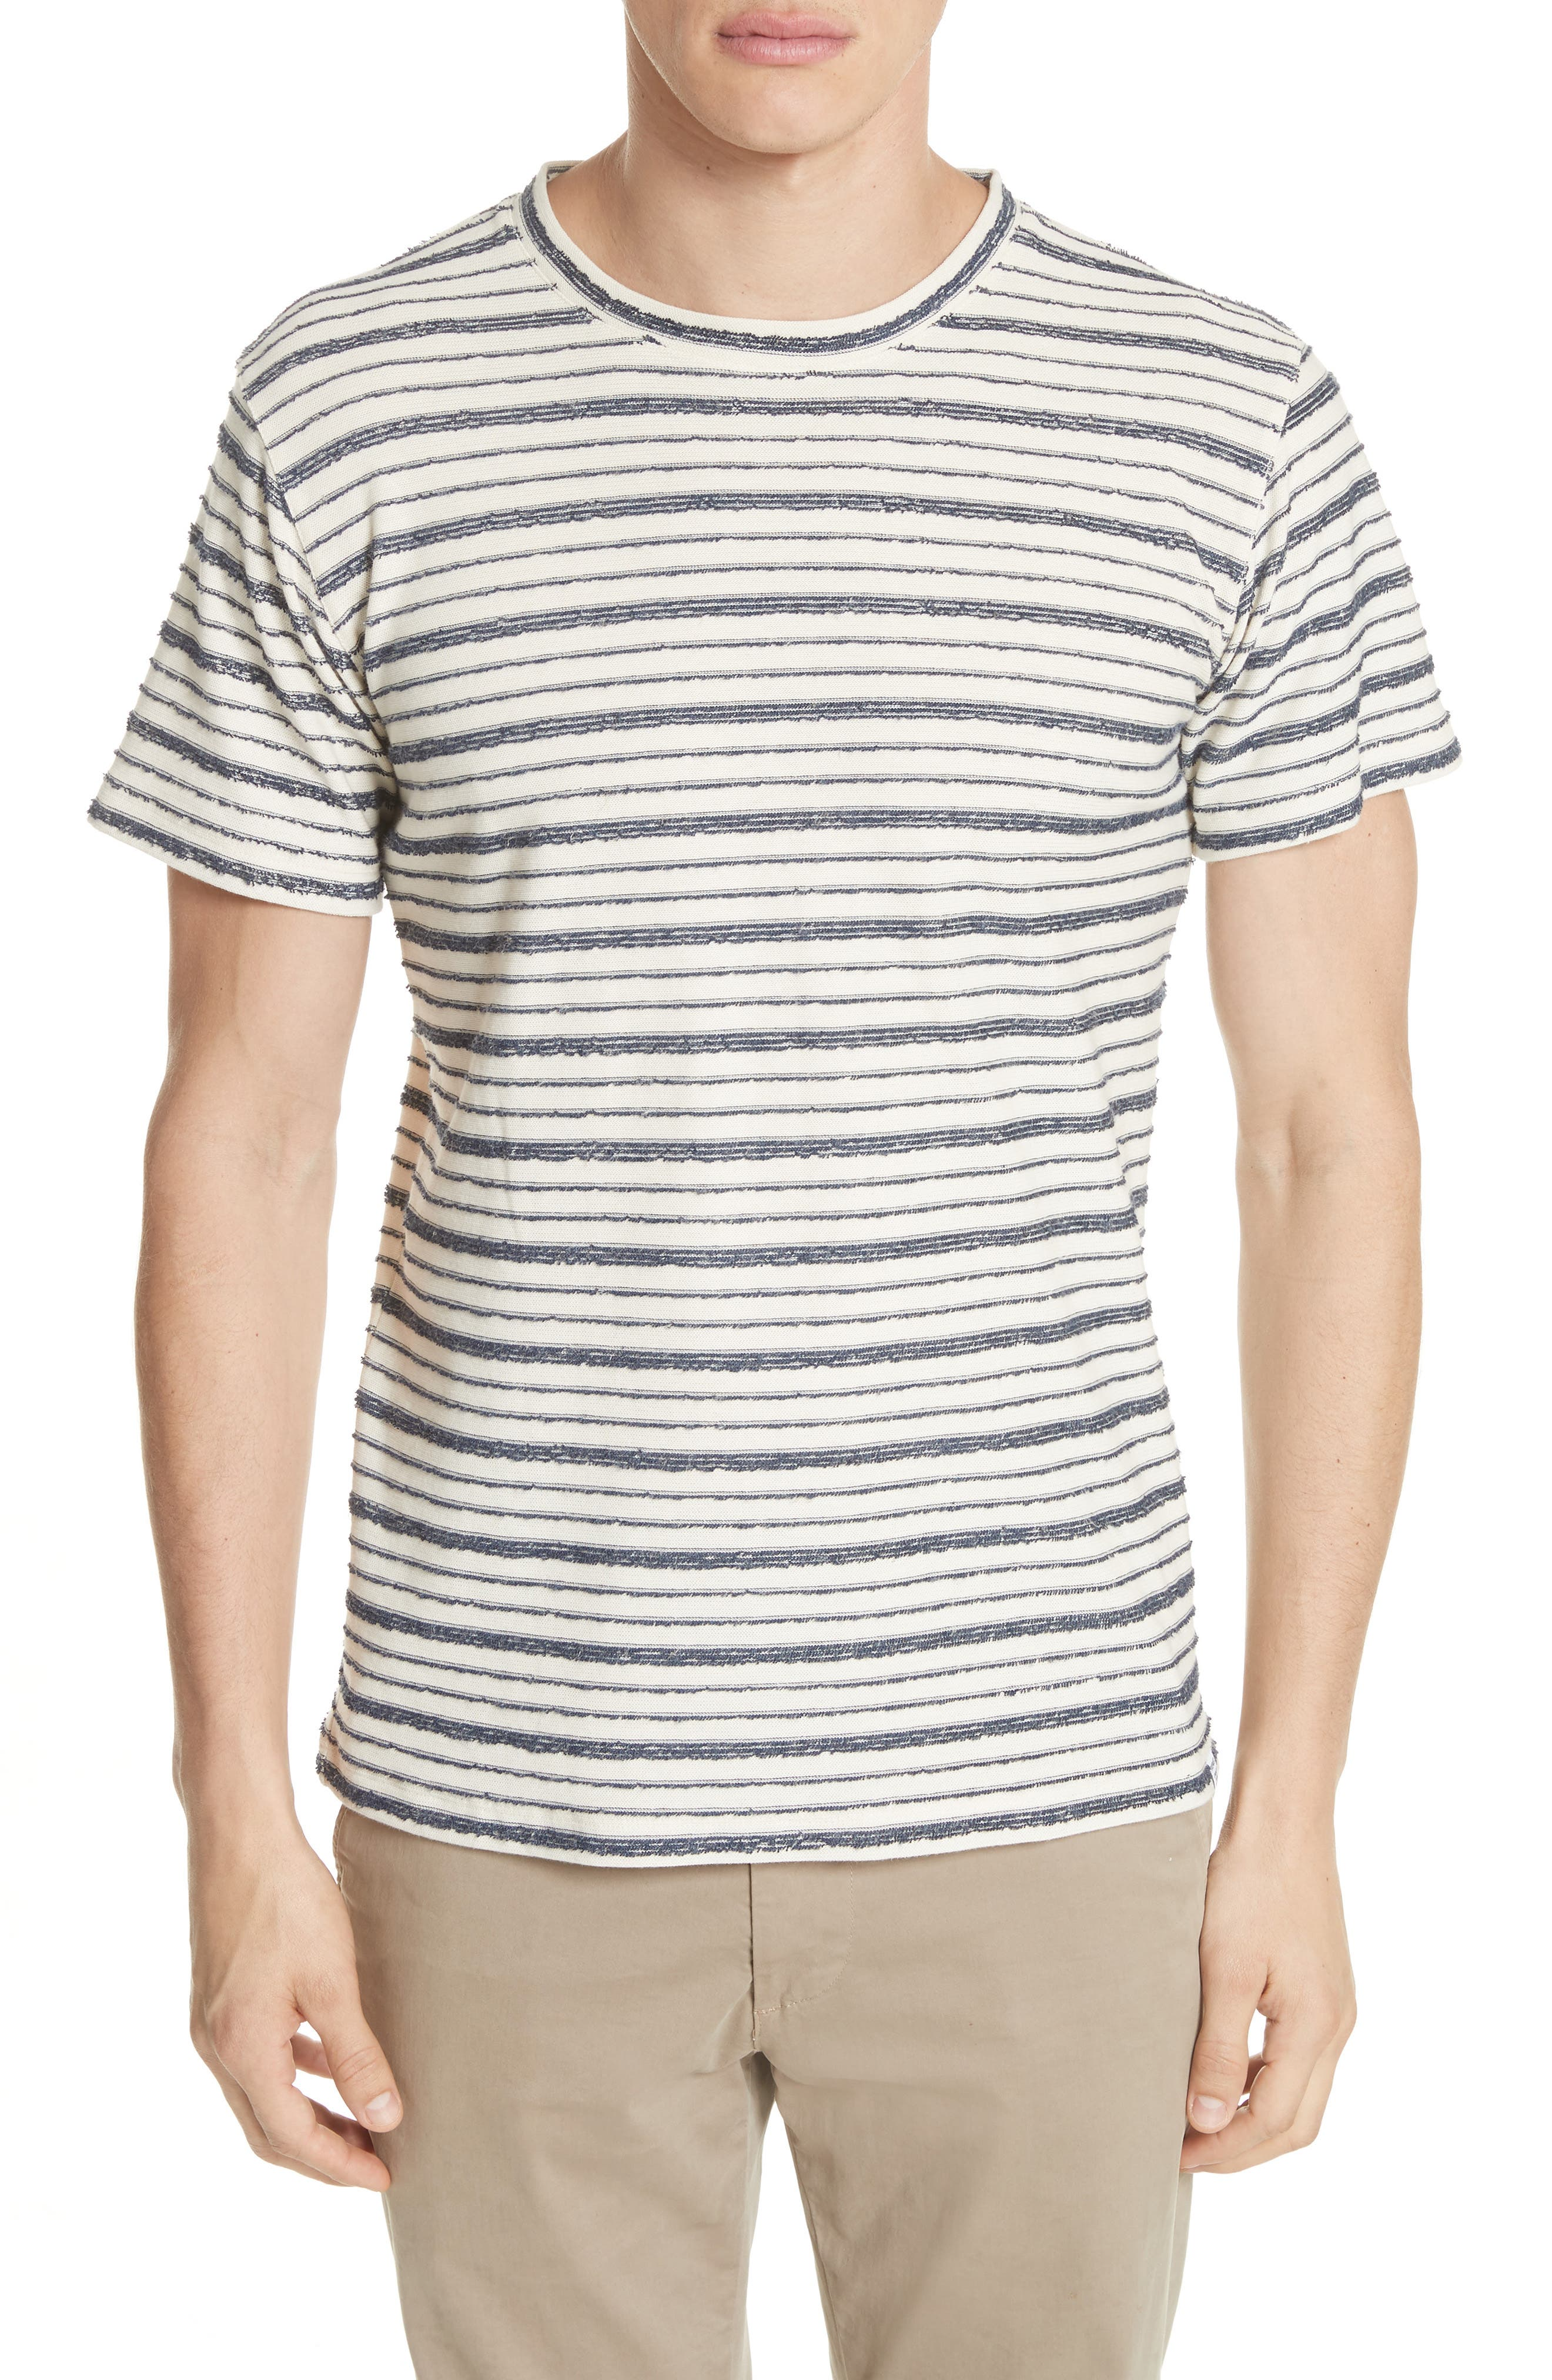 Niels Textured Stripe T-Shirt,                         Main,                         color, DARK NAVY